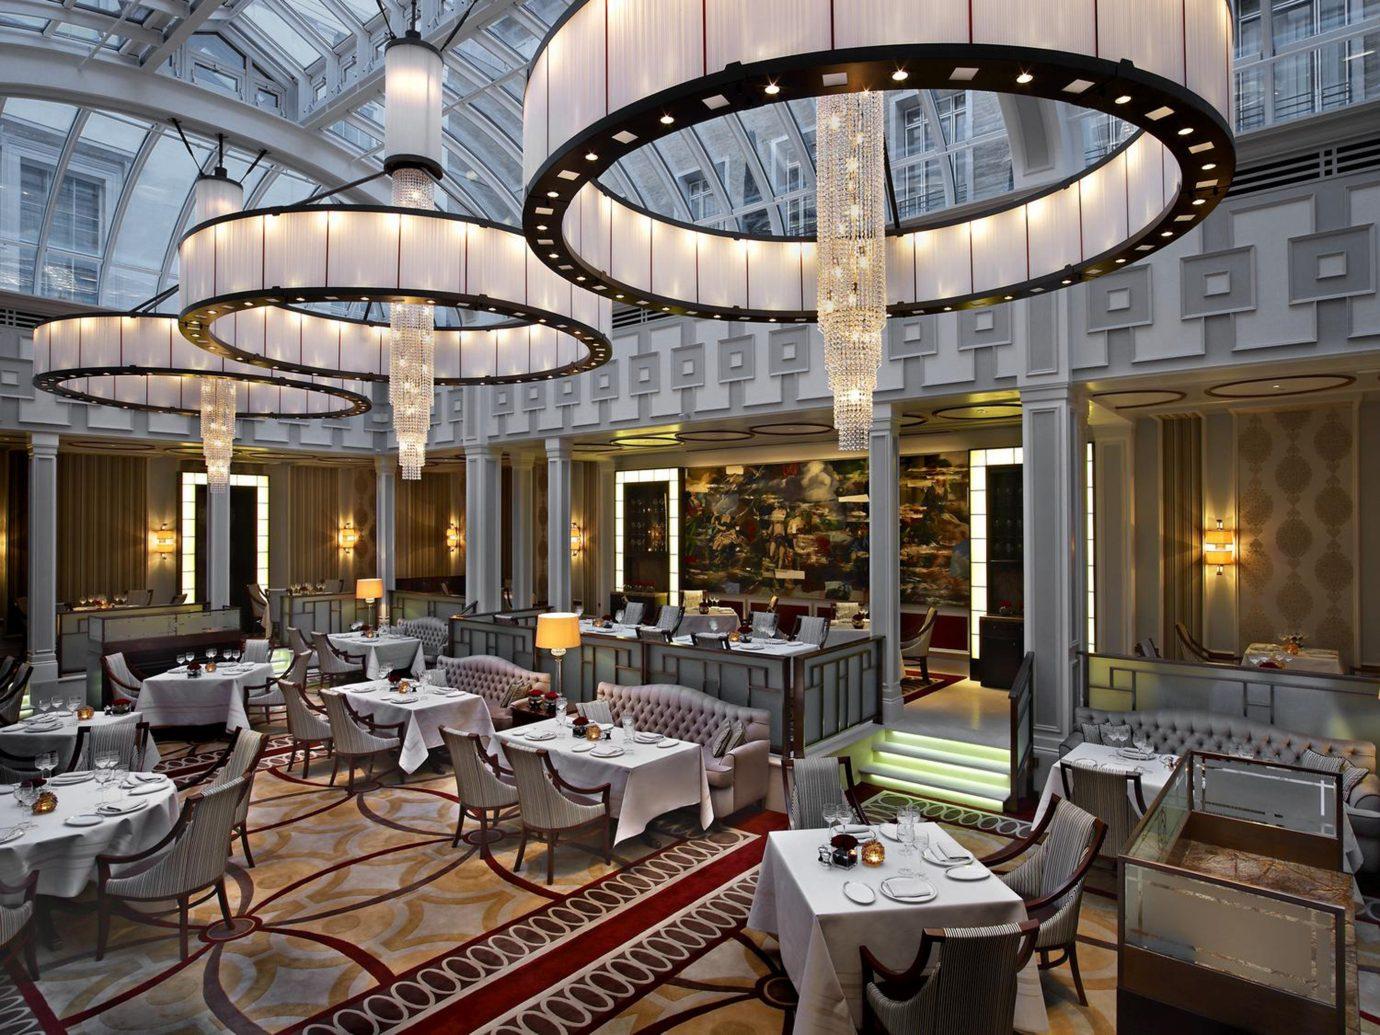 Celebs Elegant Hotels Living London Lounge Luxury Luxury Travel Romantic Trip Ideas building indoor room Lobby estate restaurant ceiling interior design lighting home dining room meal mansion living room palace